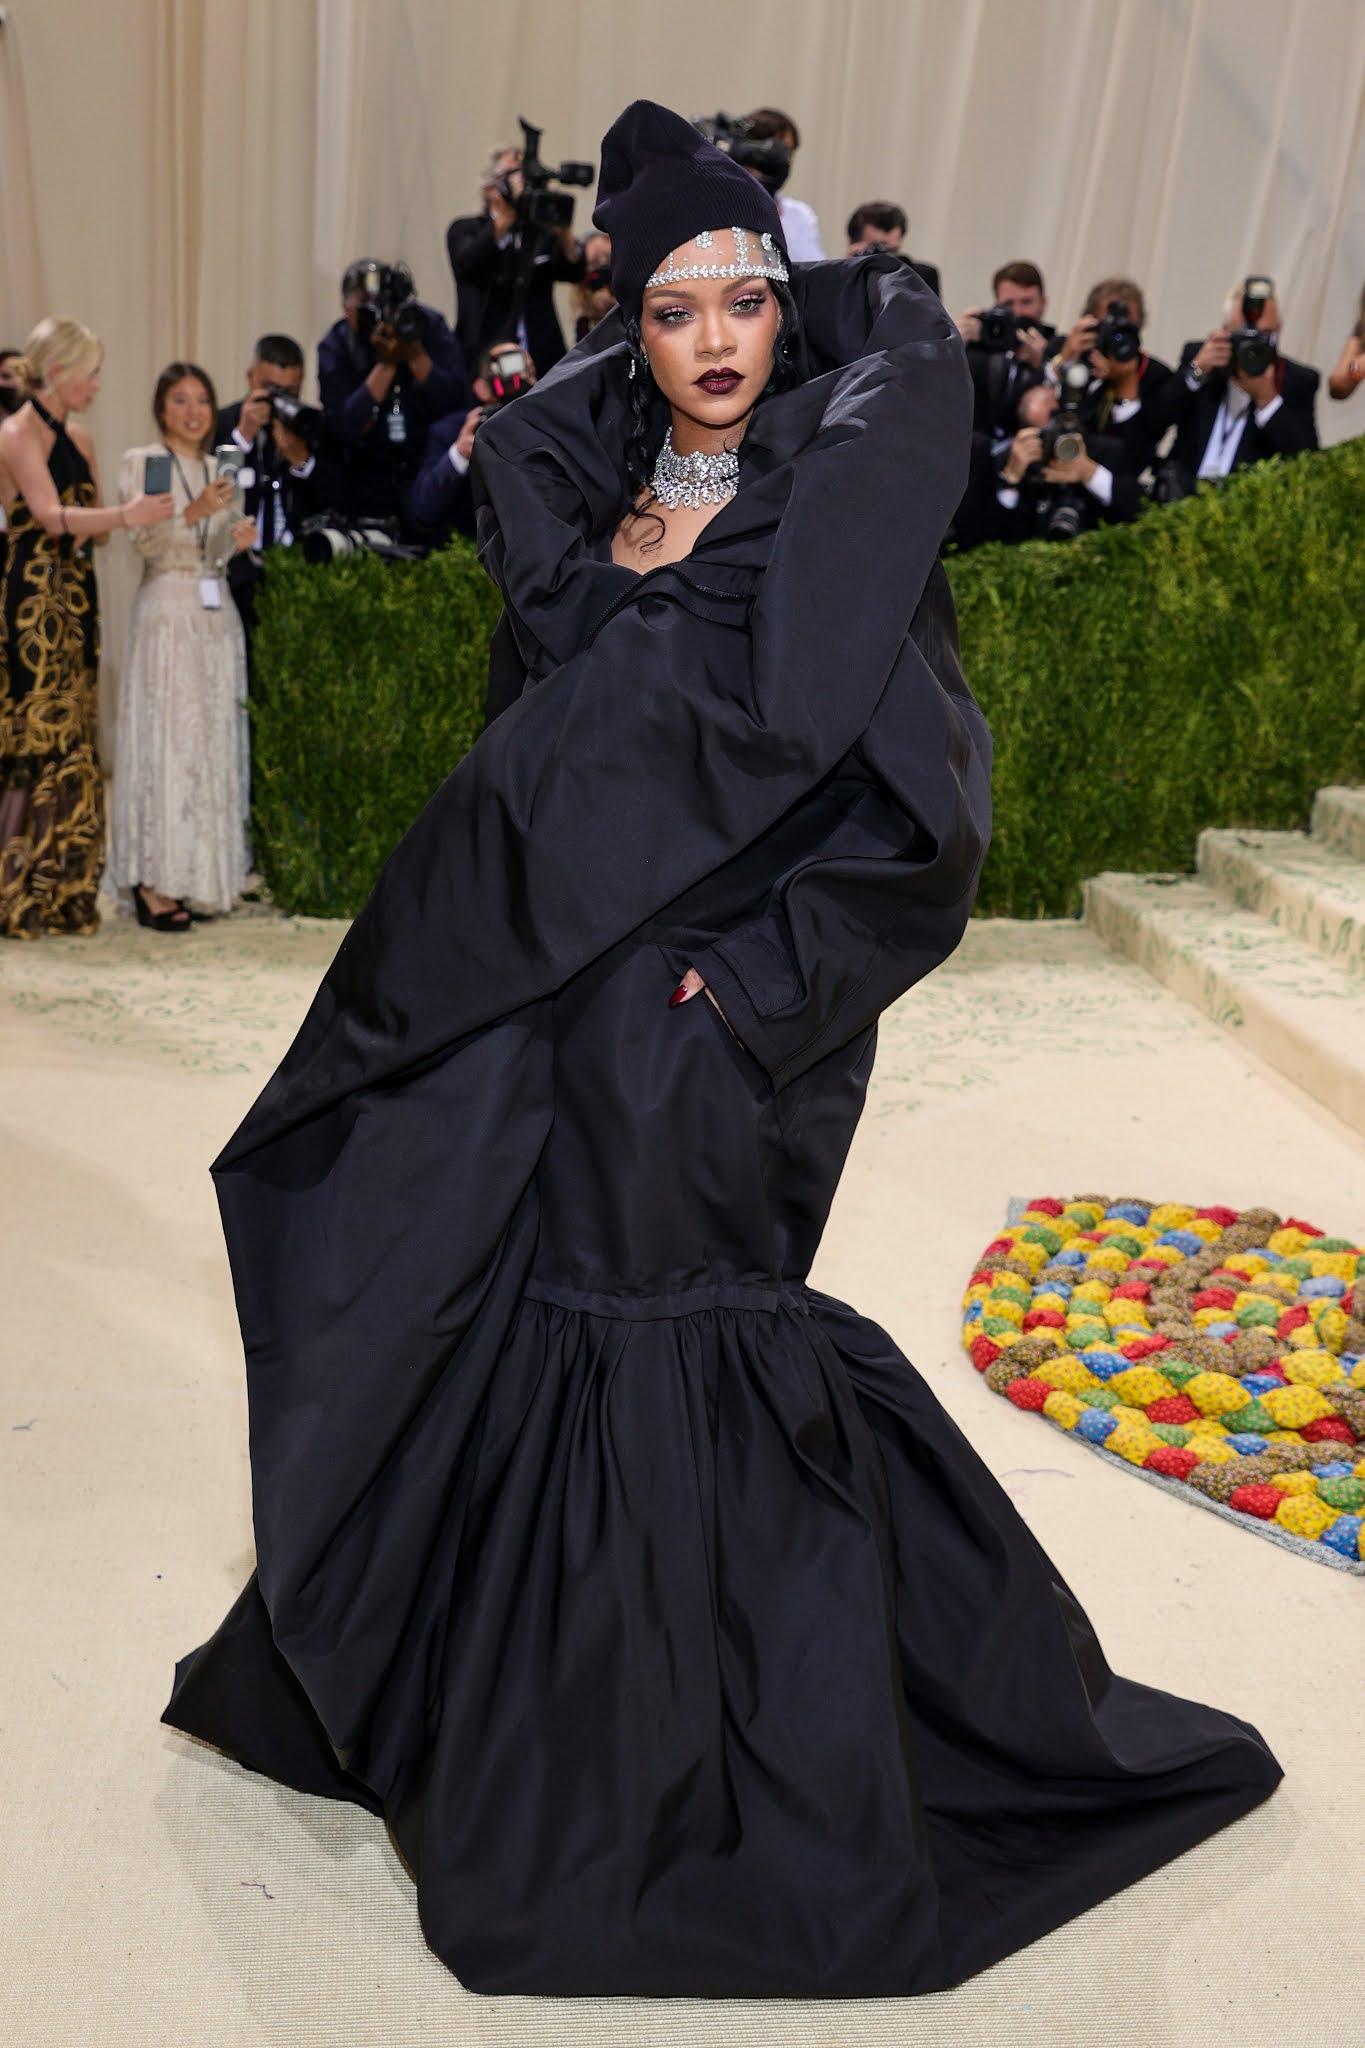 Rihanna arrives in Balenciaga to the 2021 Met Gala